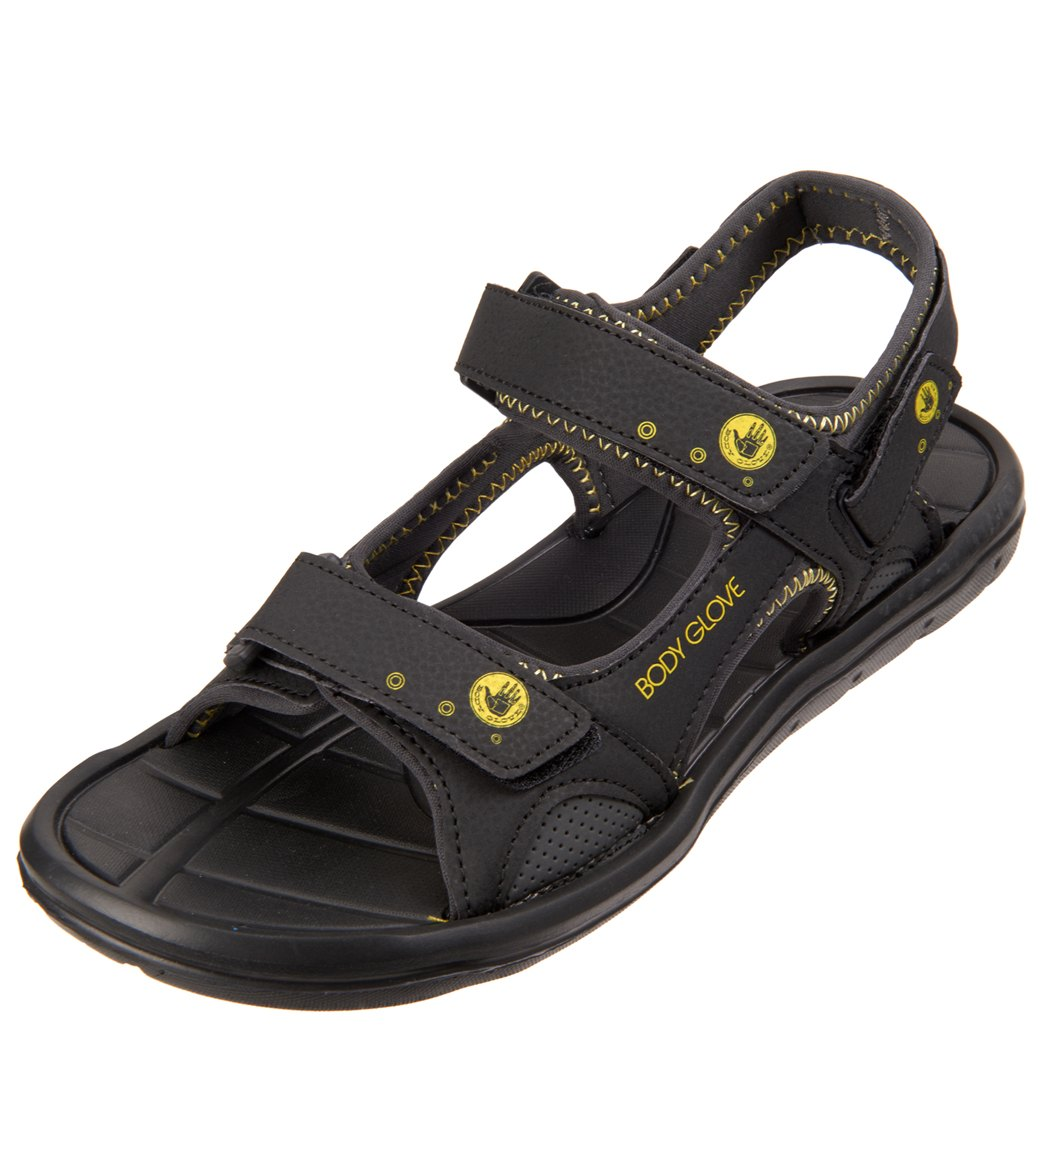 5687a669e2f349 Body Glove Men s Trek Sandal at SwimOutlet.com